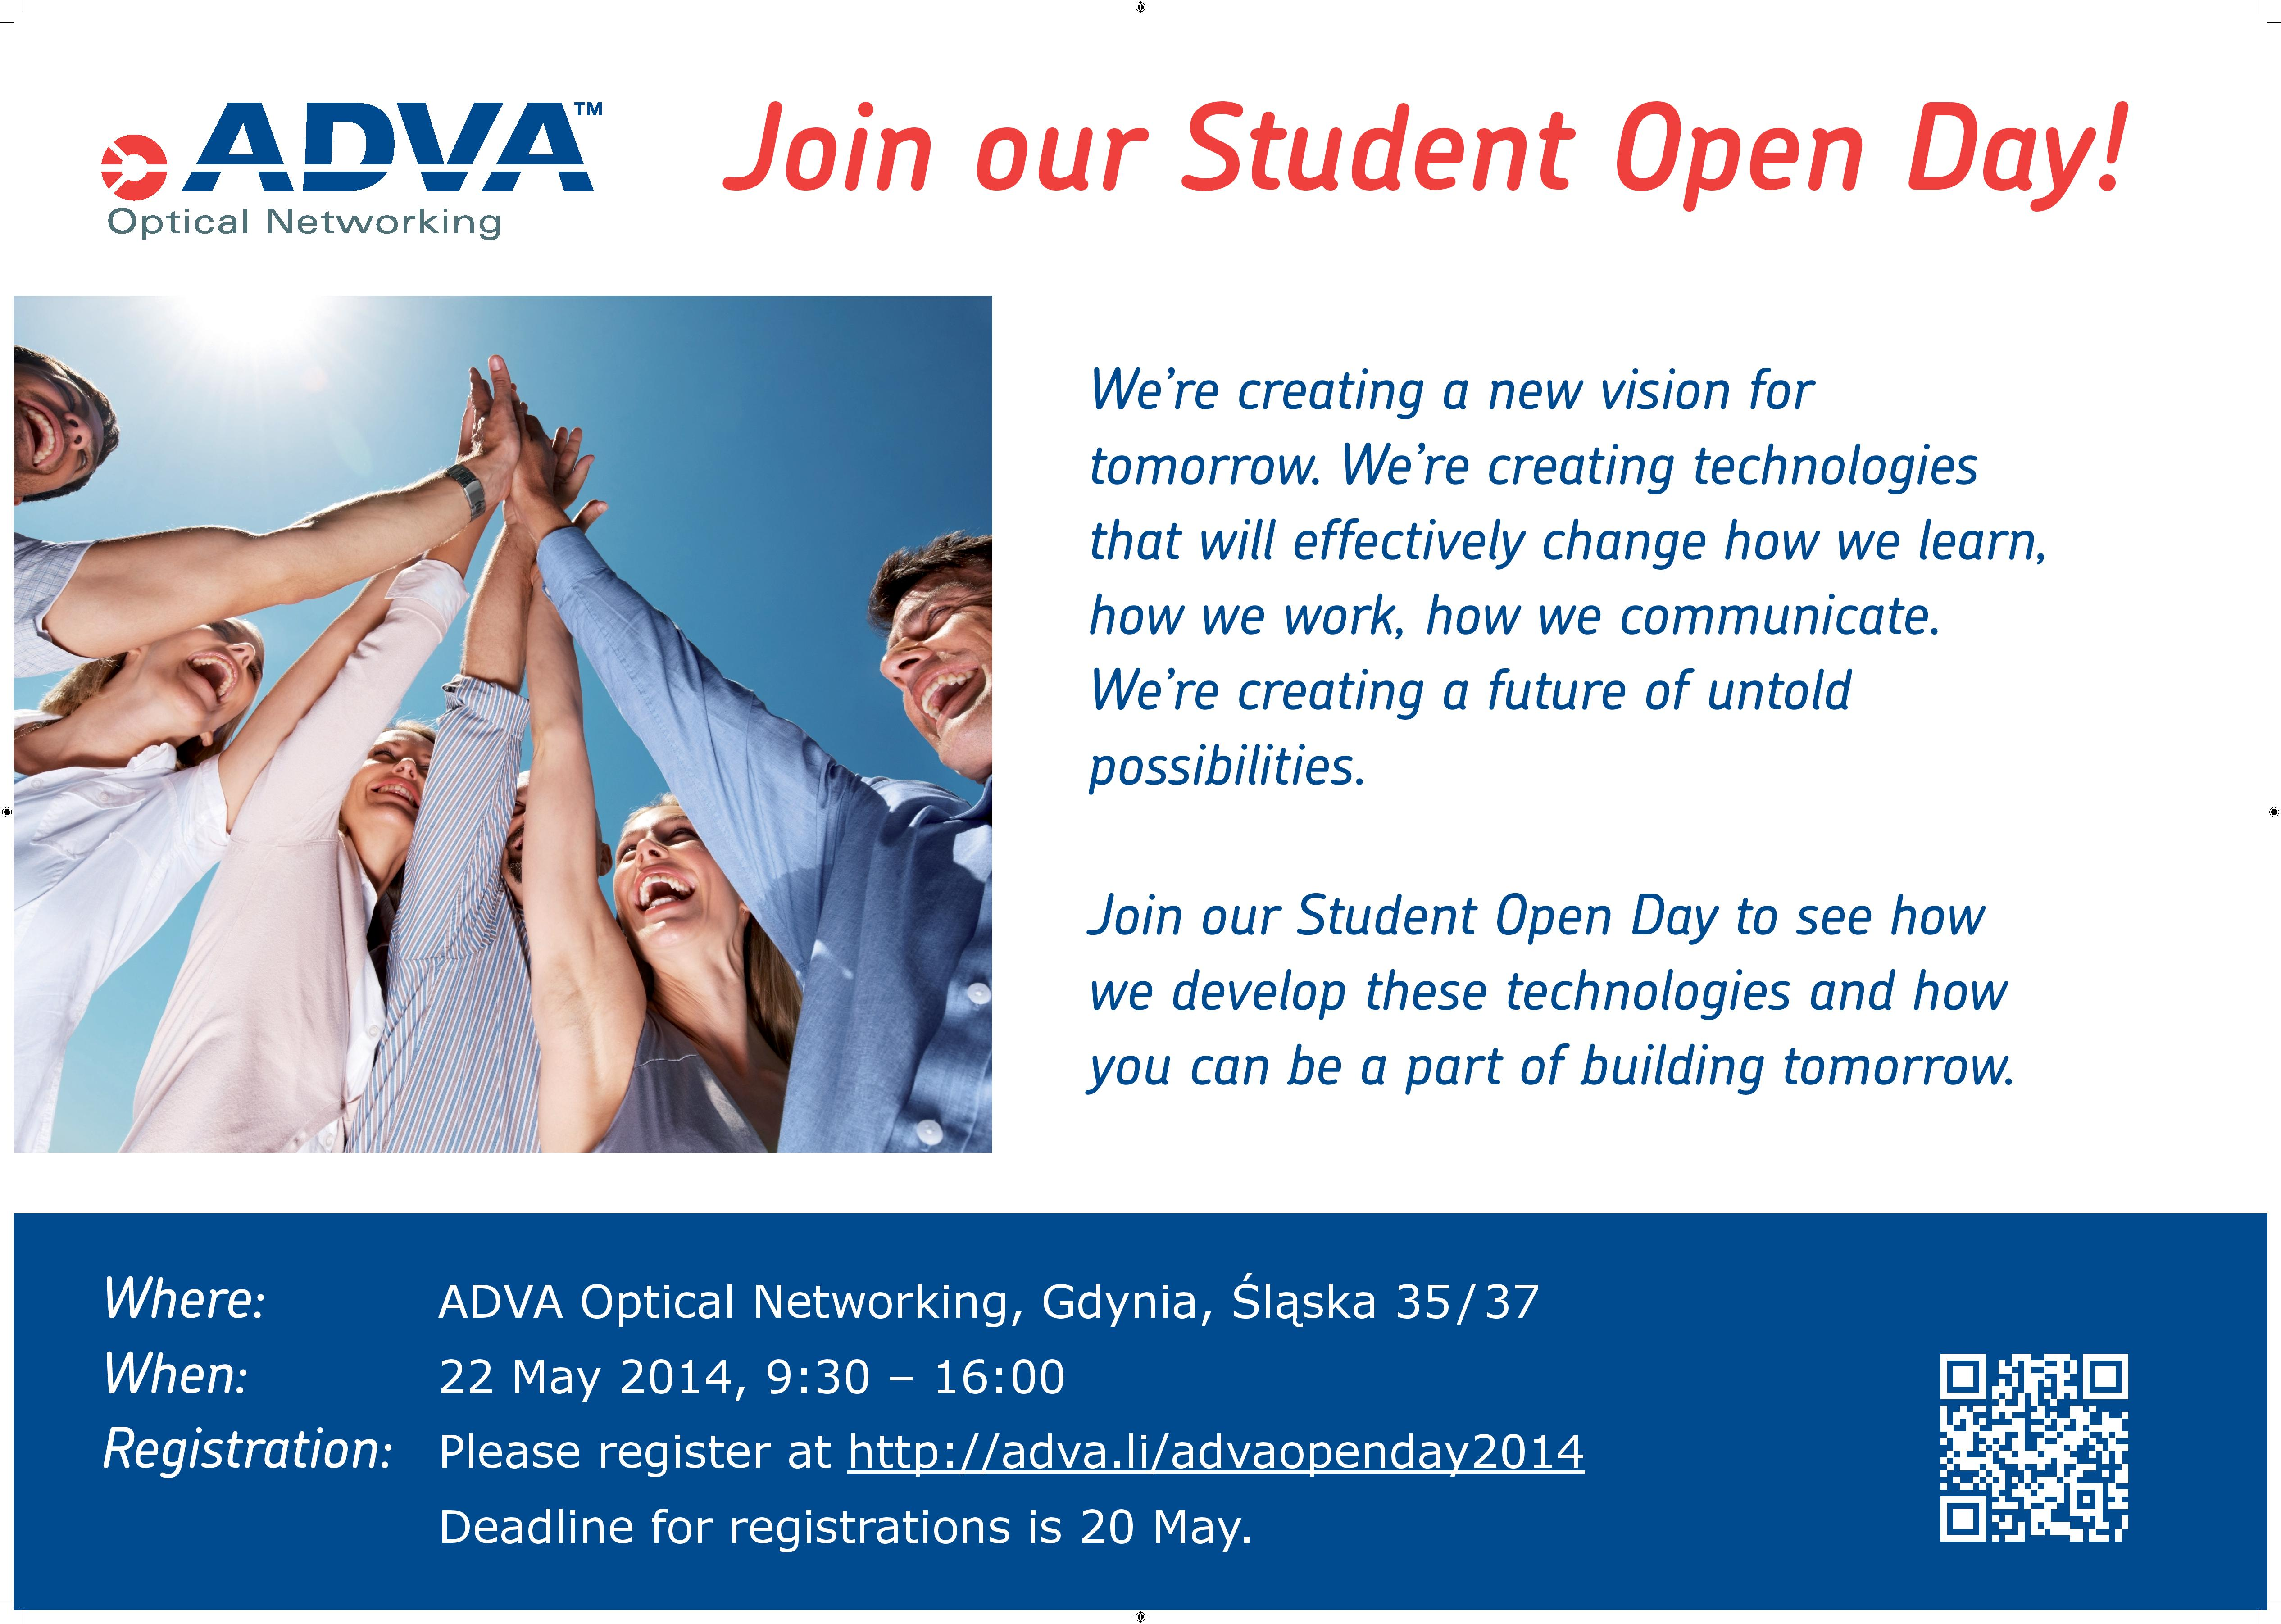 ADVA Open Day 2014